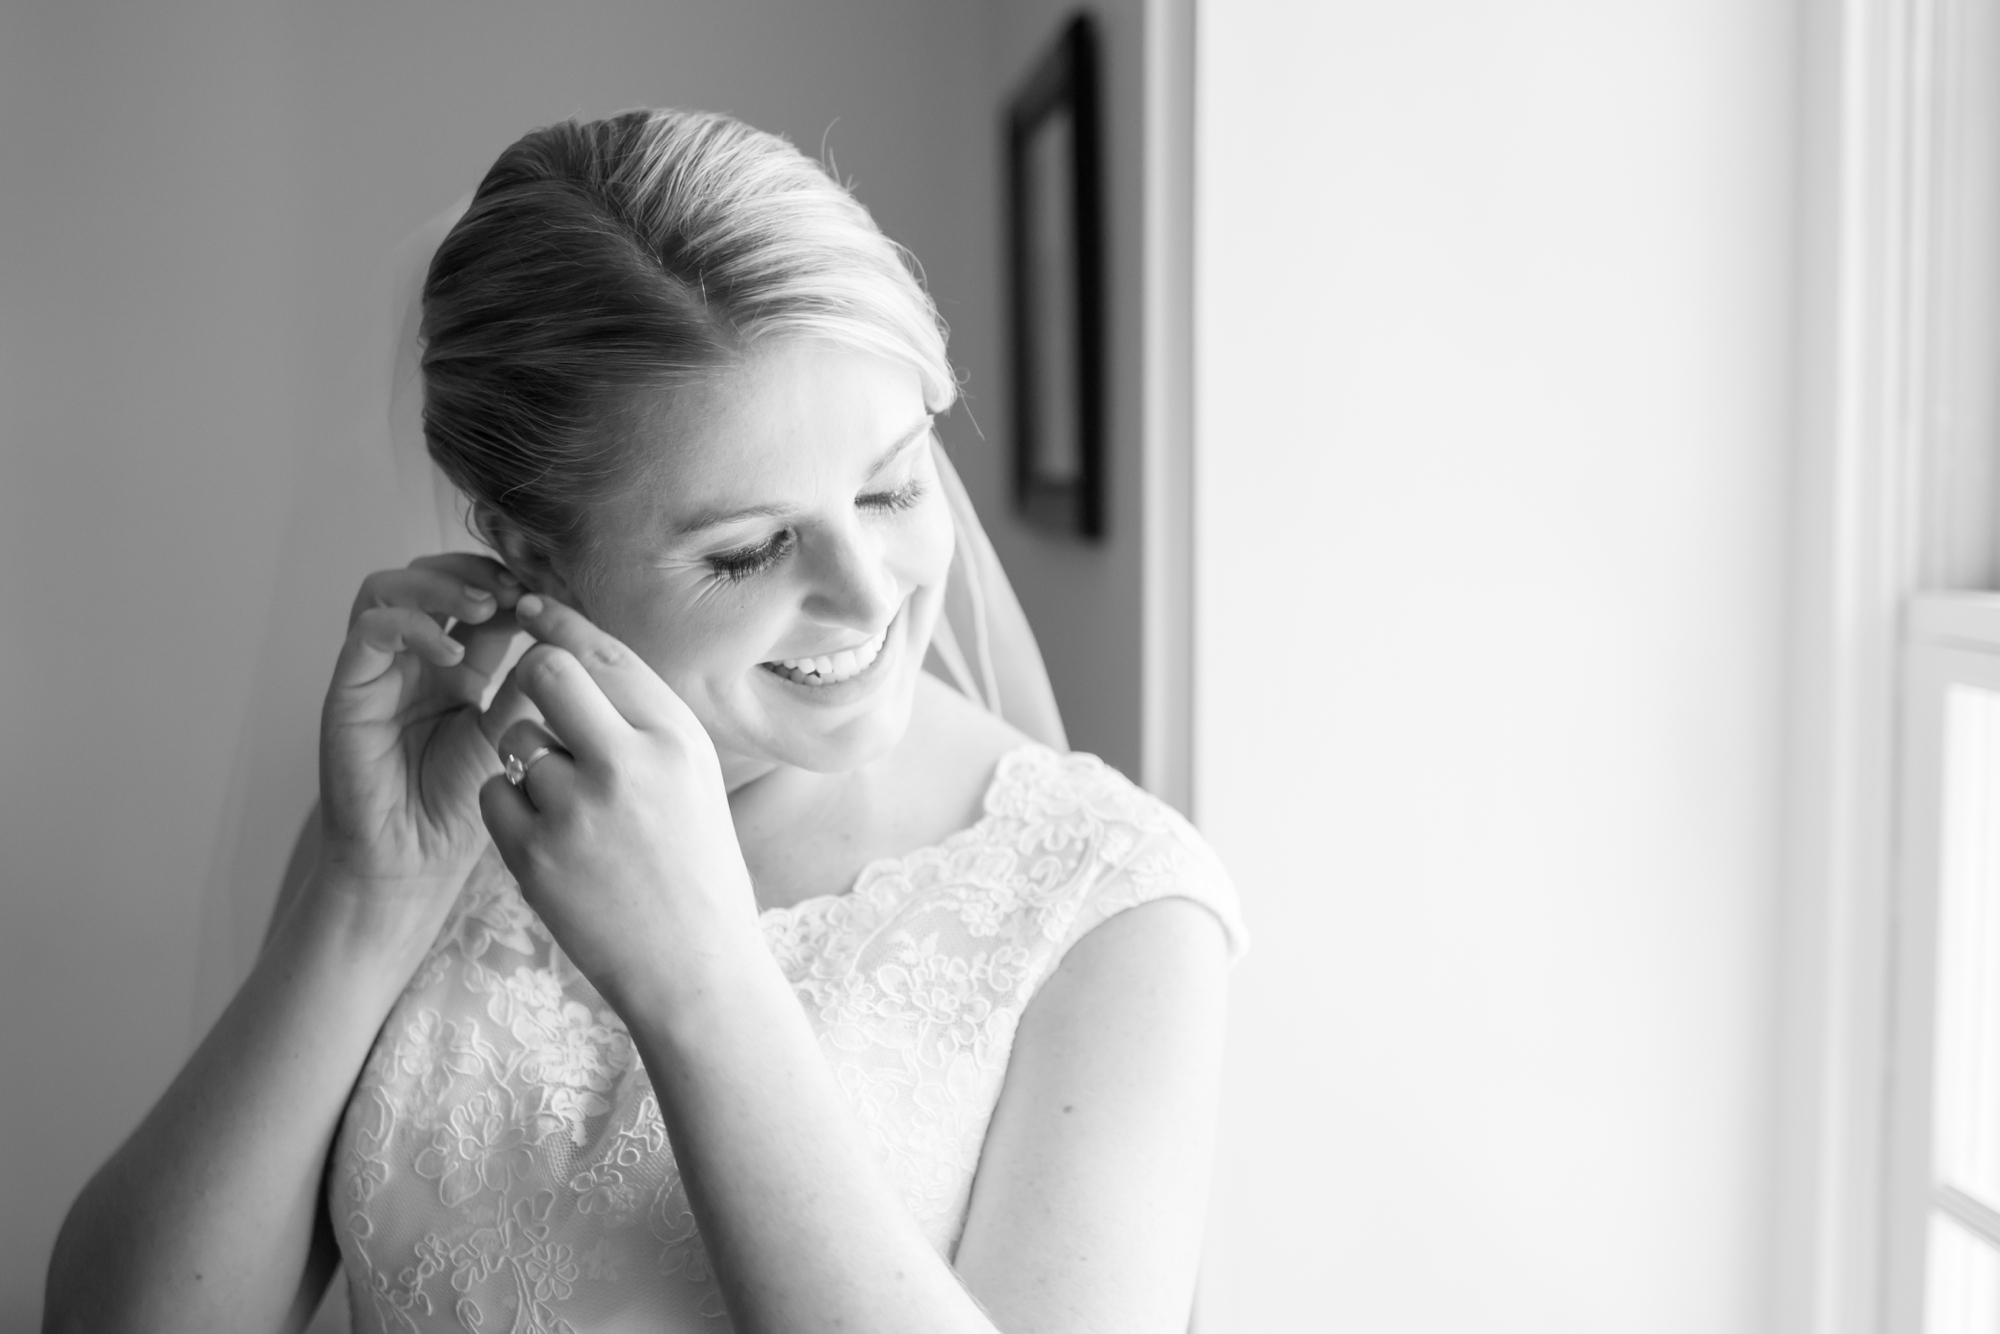 1-Miano Wedding Getting Ready-217_anna grace photography maryland wedding photographer rockland estates.jpg